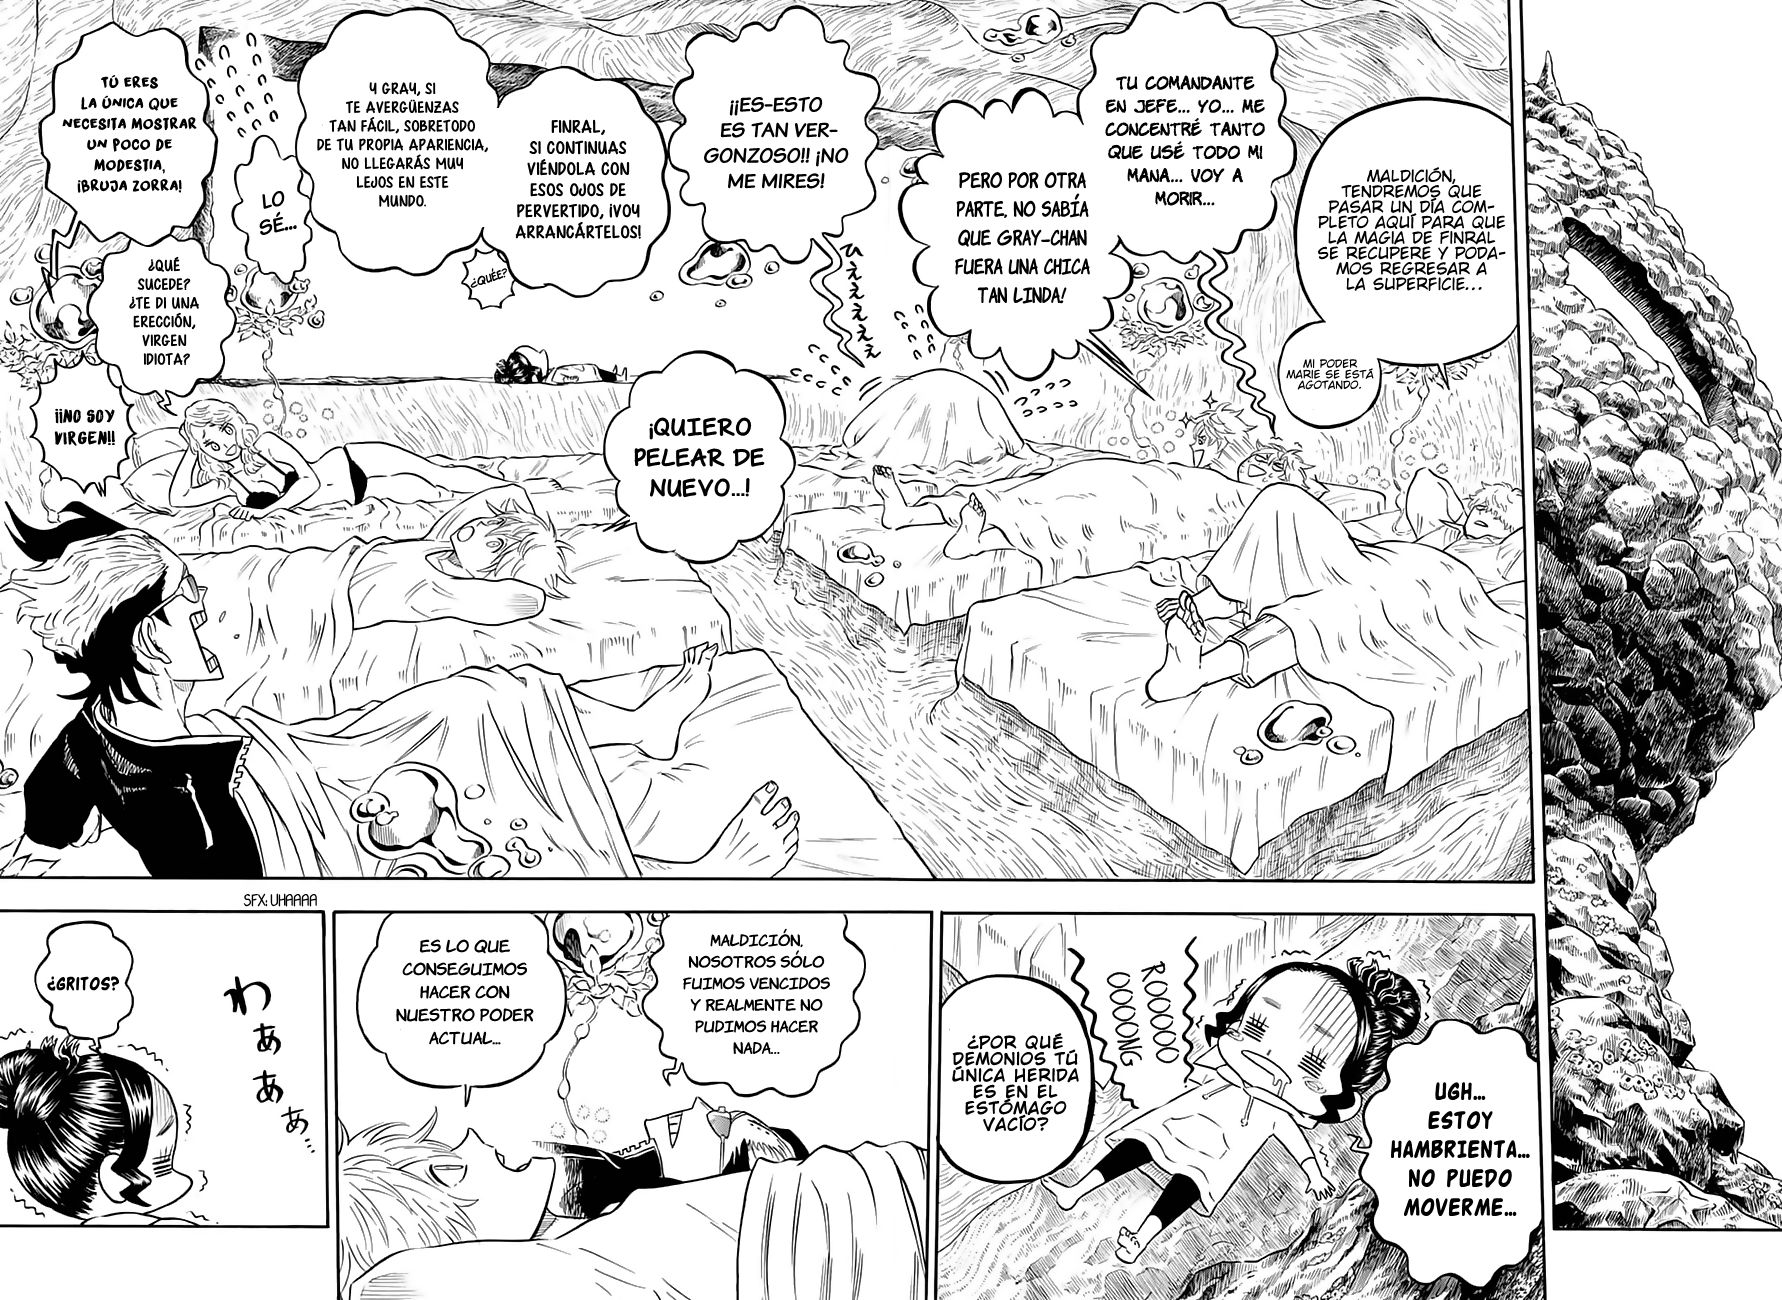 http://c5.ninemanga.com/es_manga/pic2/35/3811/488644/996a7121b7bfa4c1754abbf8d46405af.jpg Page 7